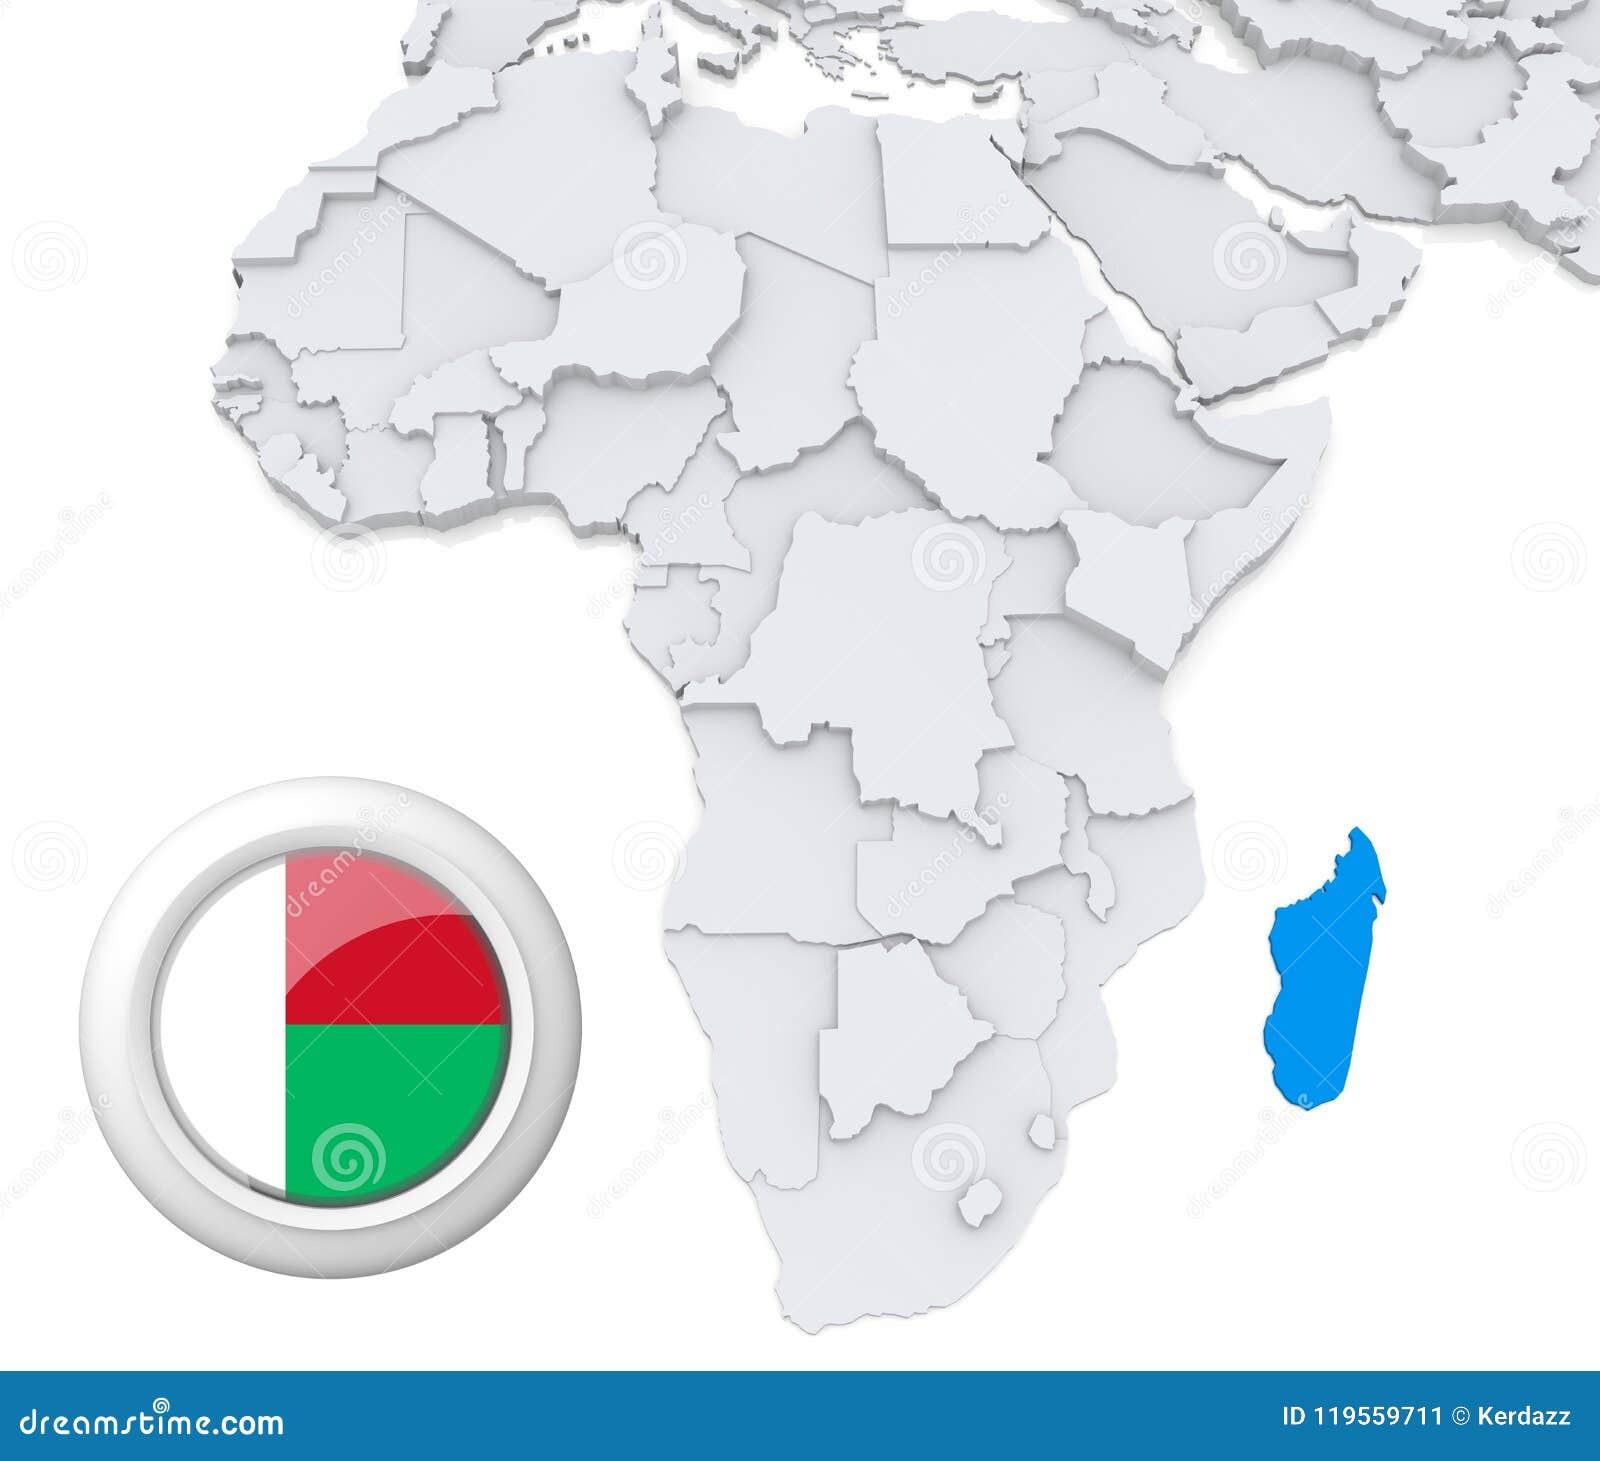 Madagascar On Africa Map Stock Illustration Illustration Of Flag